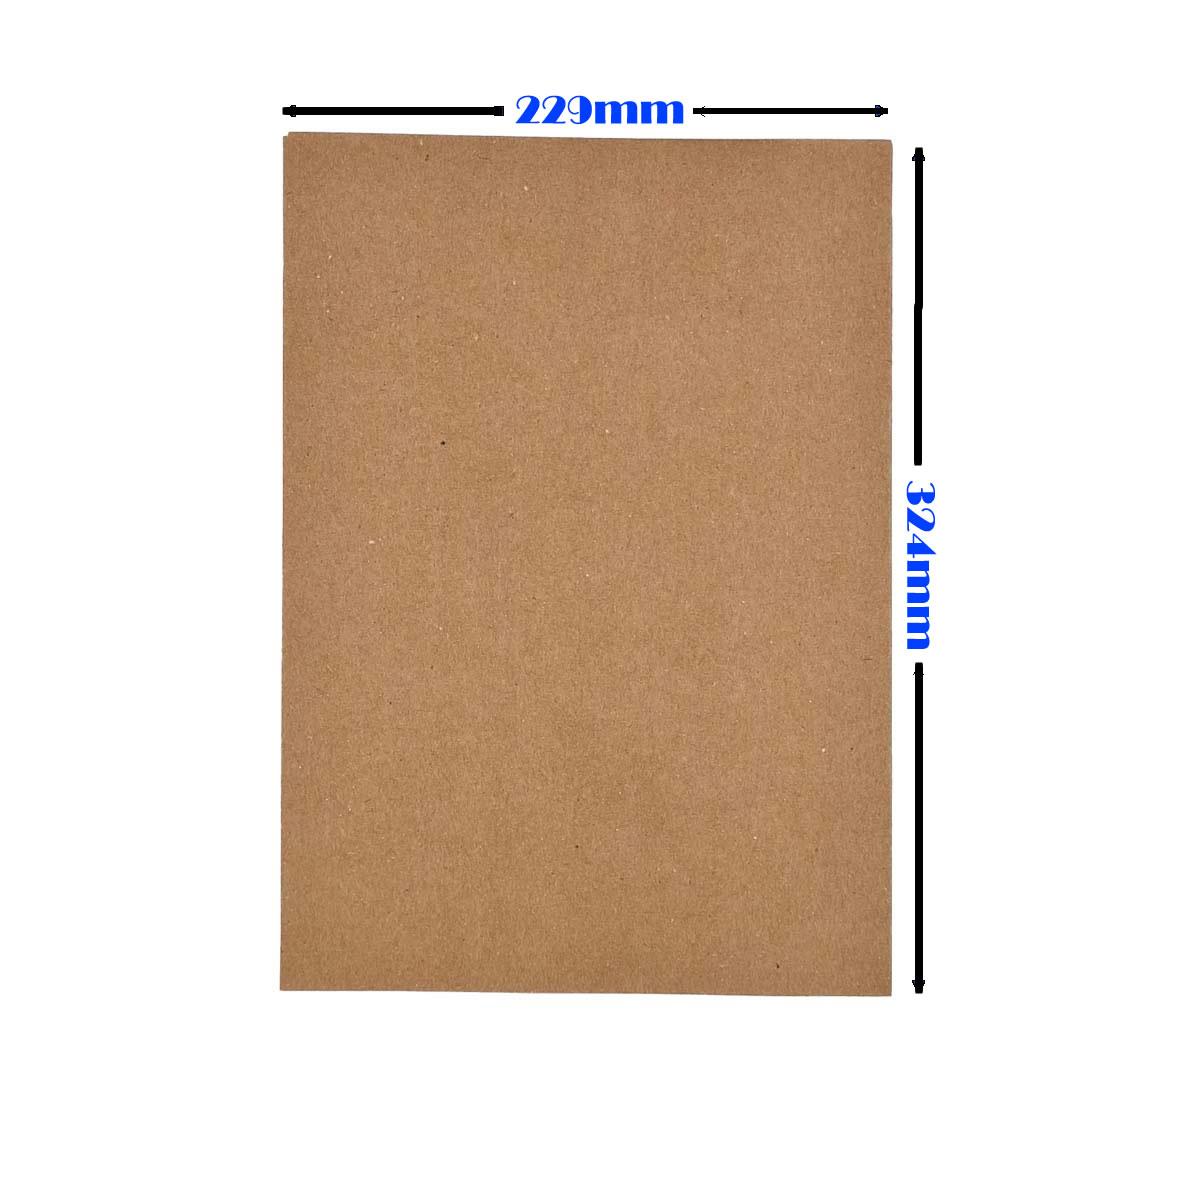 Envelope Saco kraft Natural 80g 229x324 Foroni com 250un Cabe A4